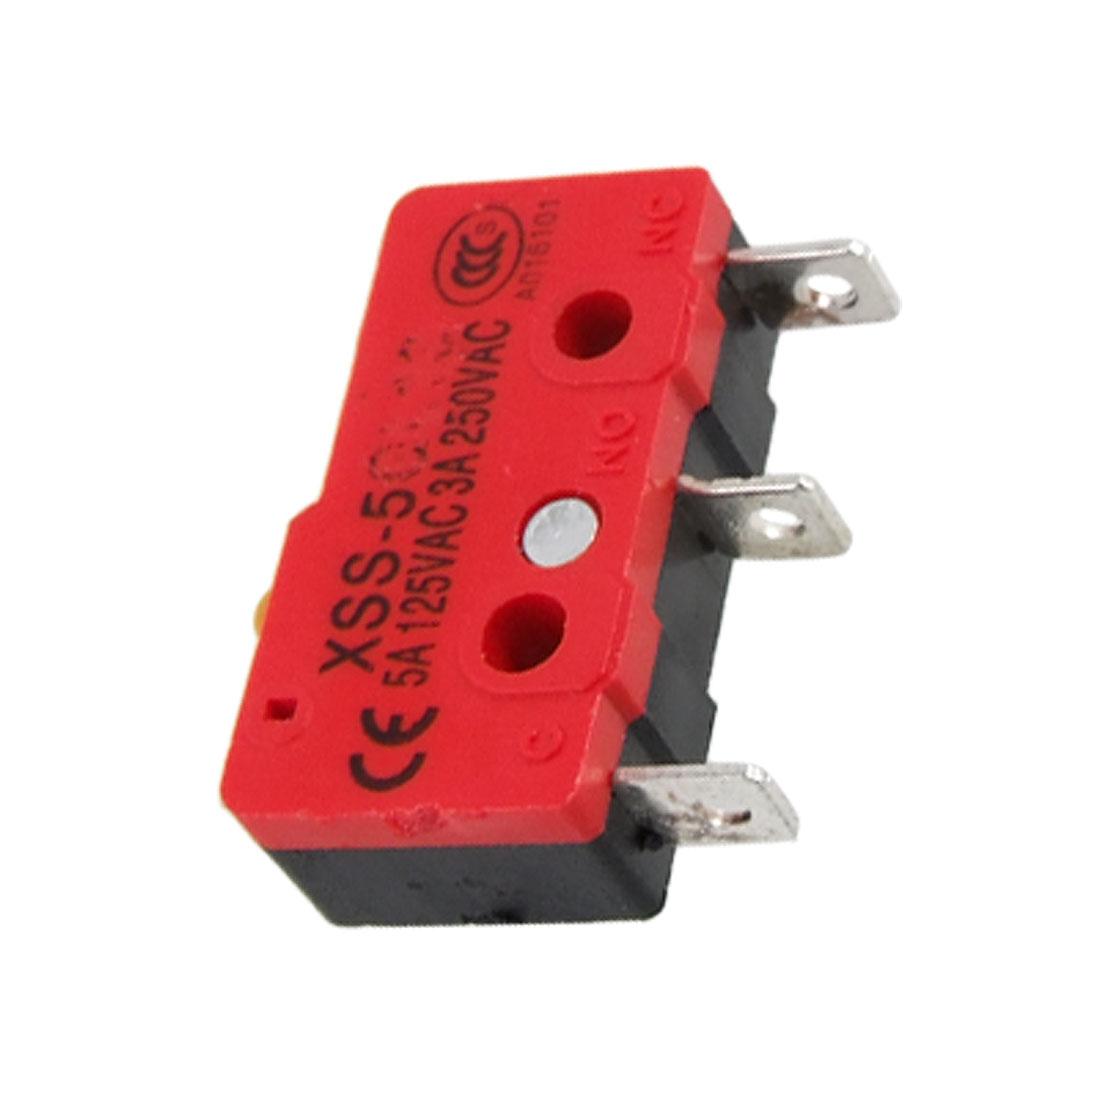 Mini-Handdruck-Taste-Sender-XSS-5-Mikroschalter